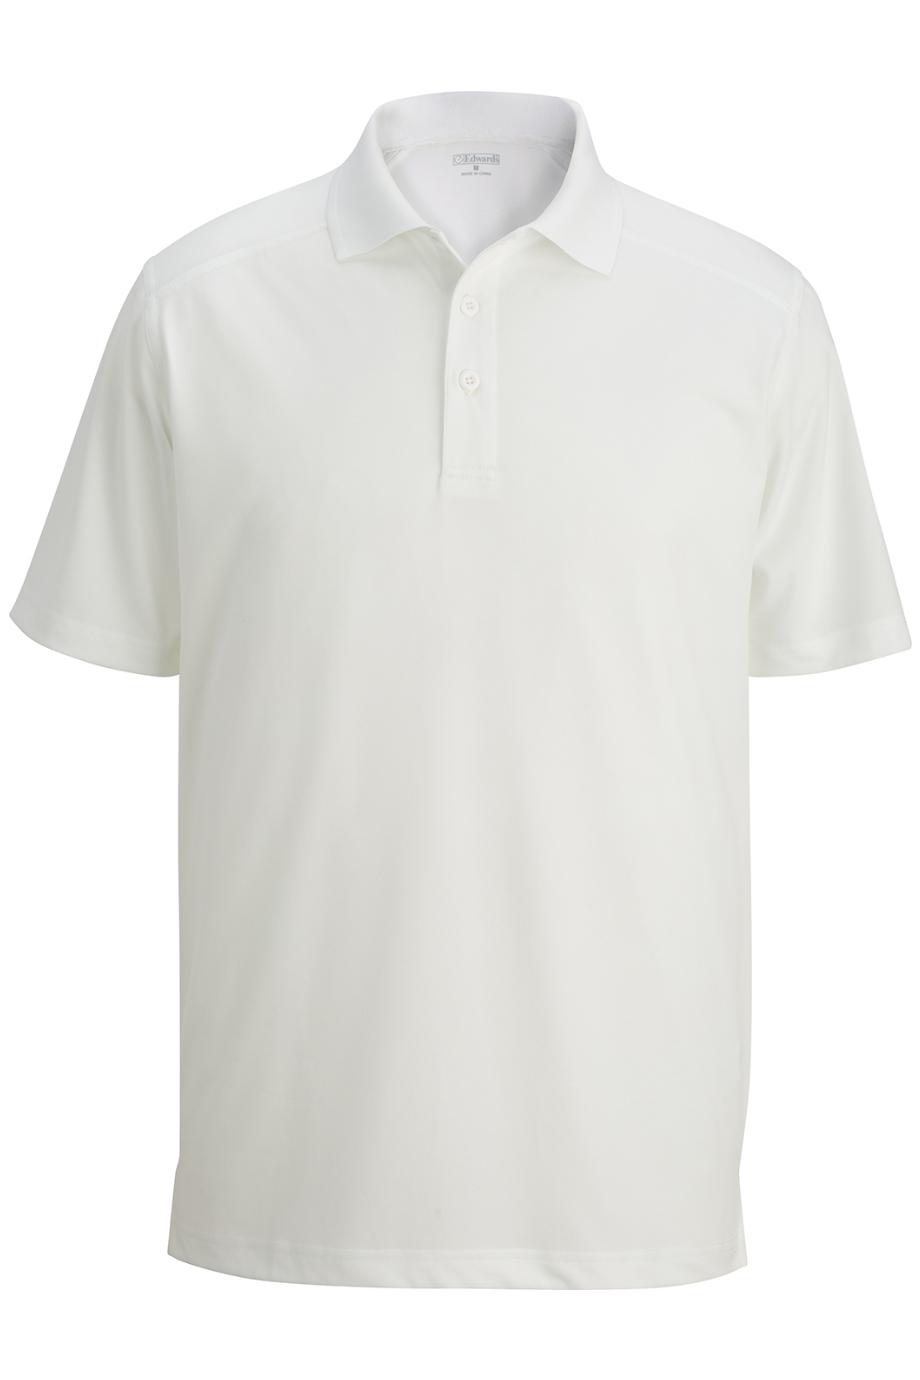 Edwards Mens SNAG-Proof Short Sleeve Polo Large Fern Green